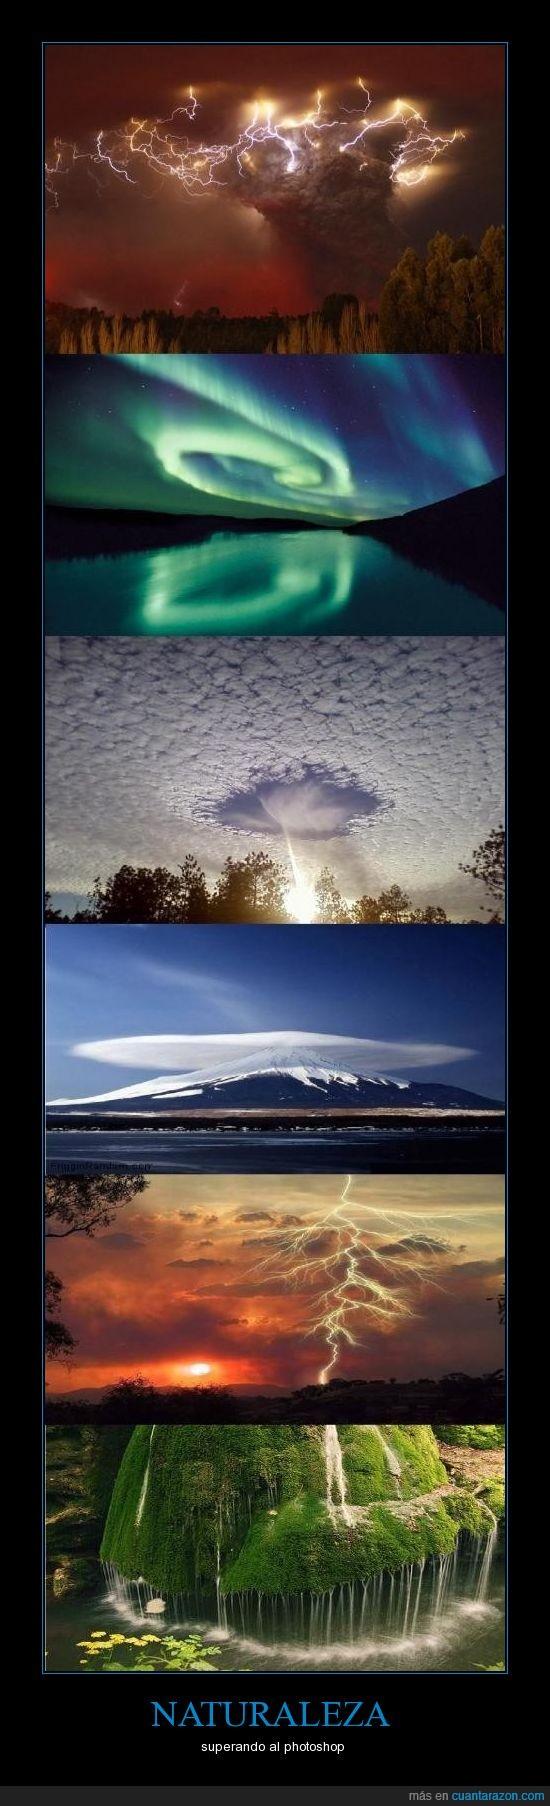 cascada,cielo,impresiona,naturaleza,nube,photoshop,rayo,verde